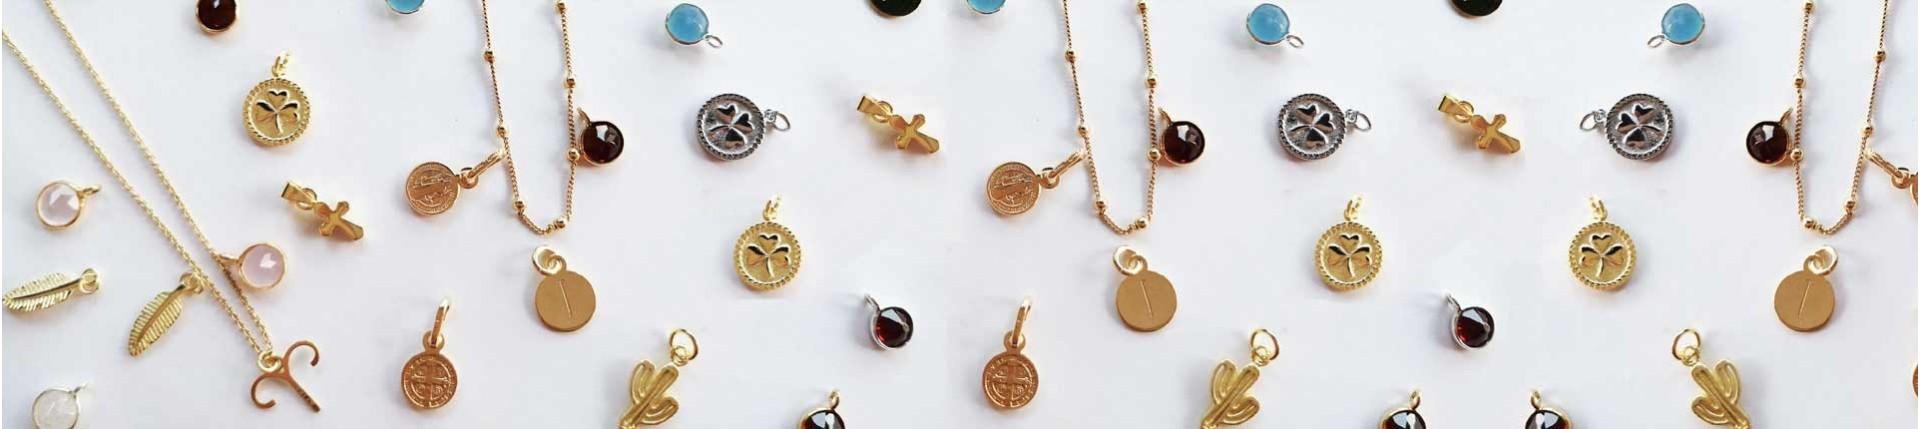 Chains Necklaces